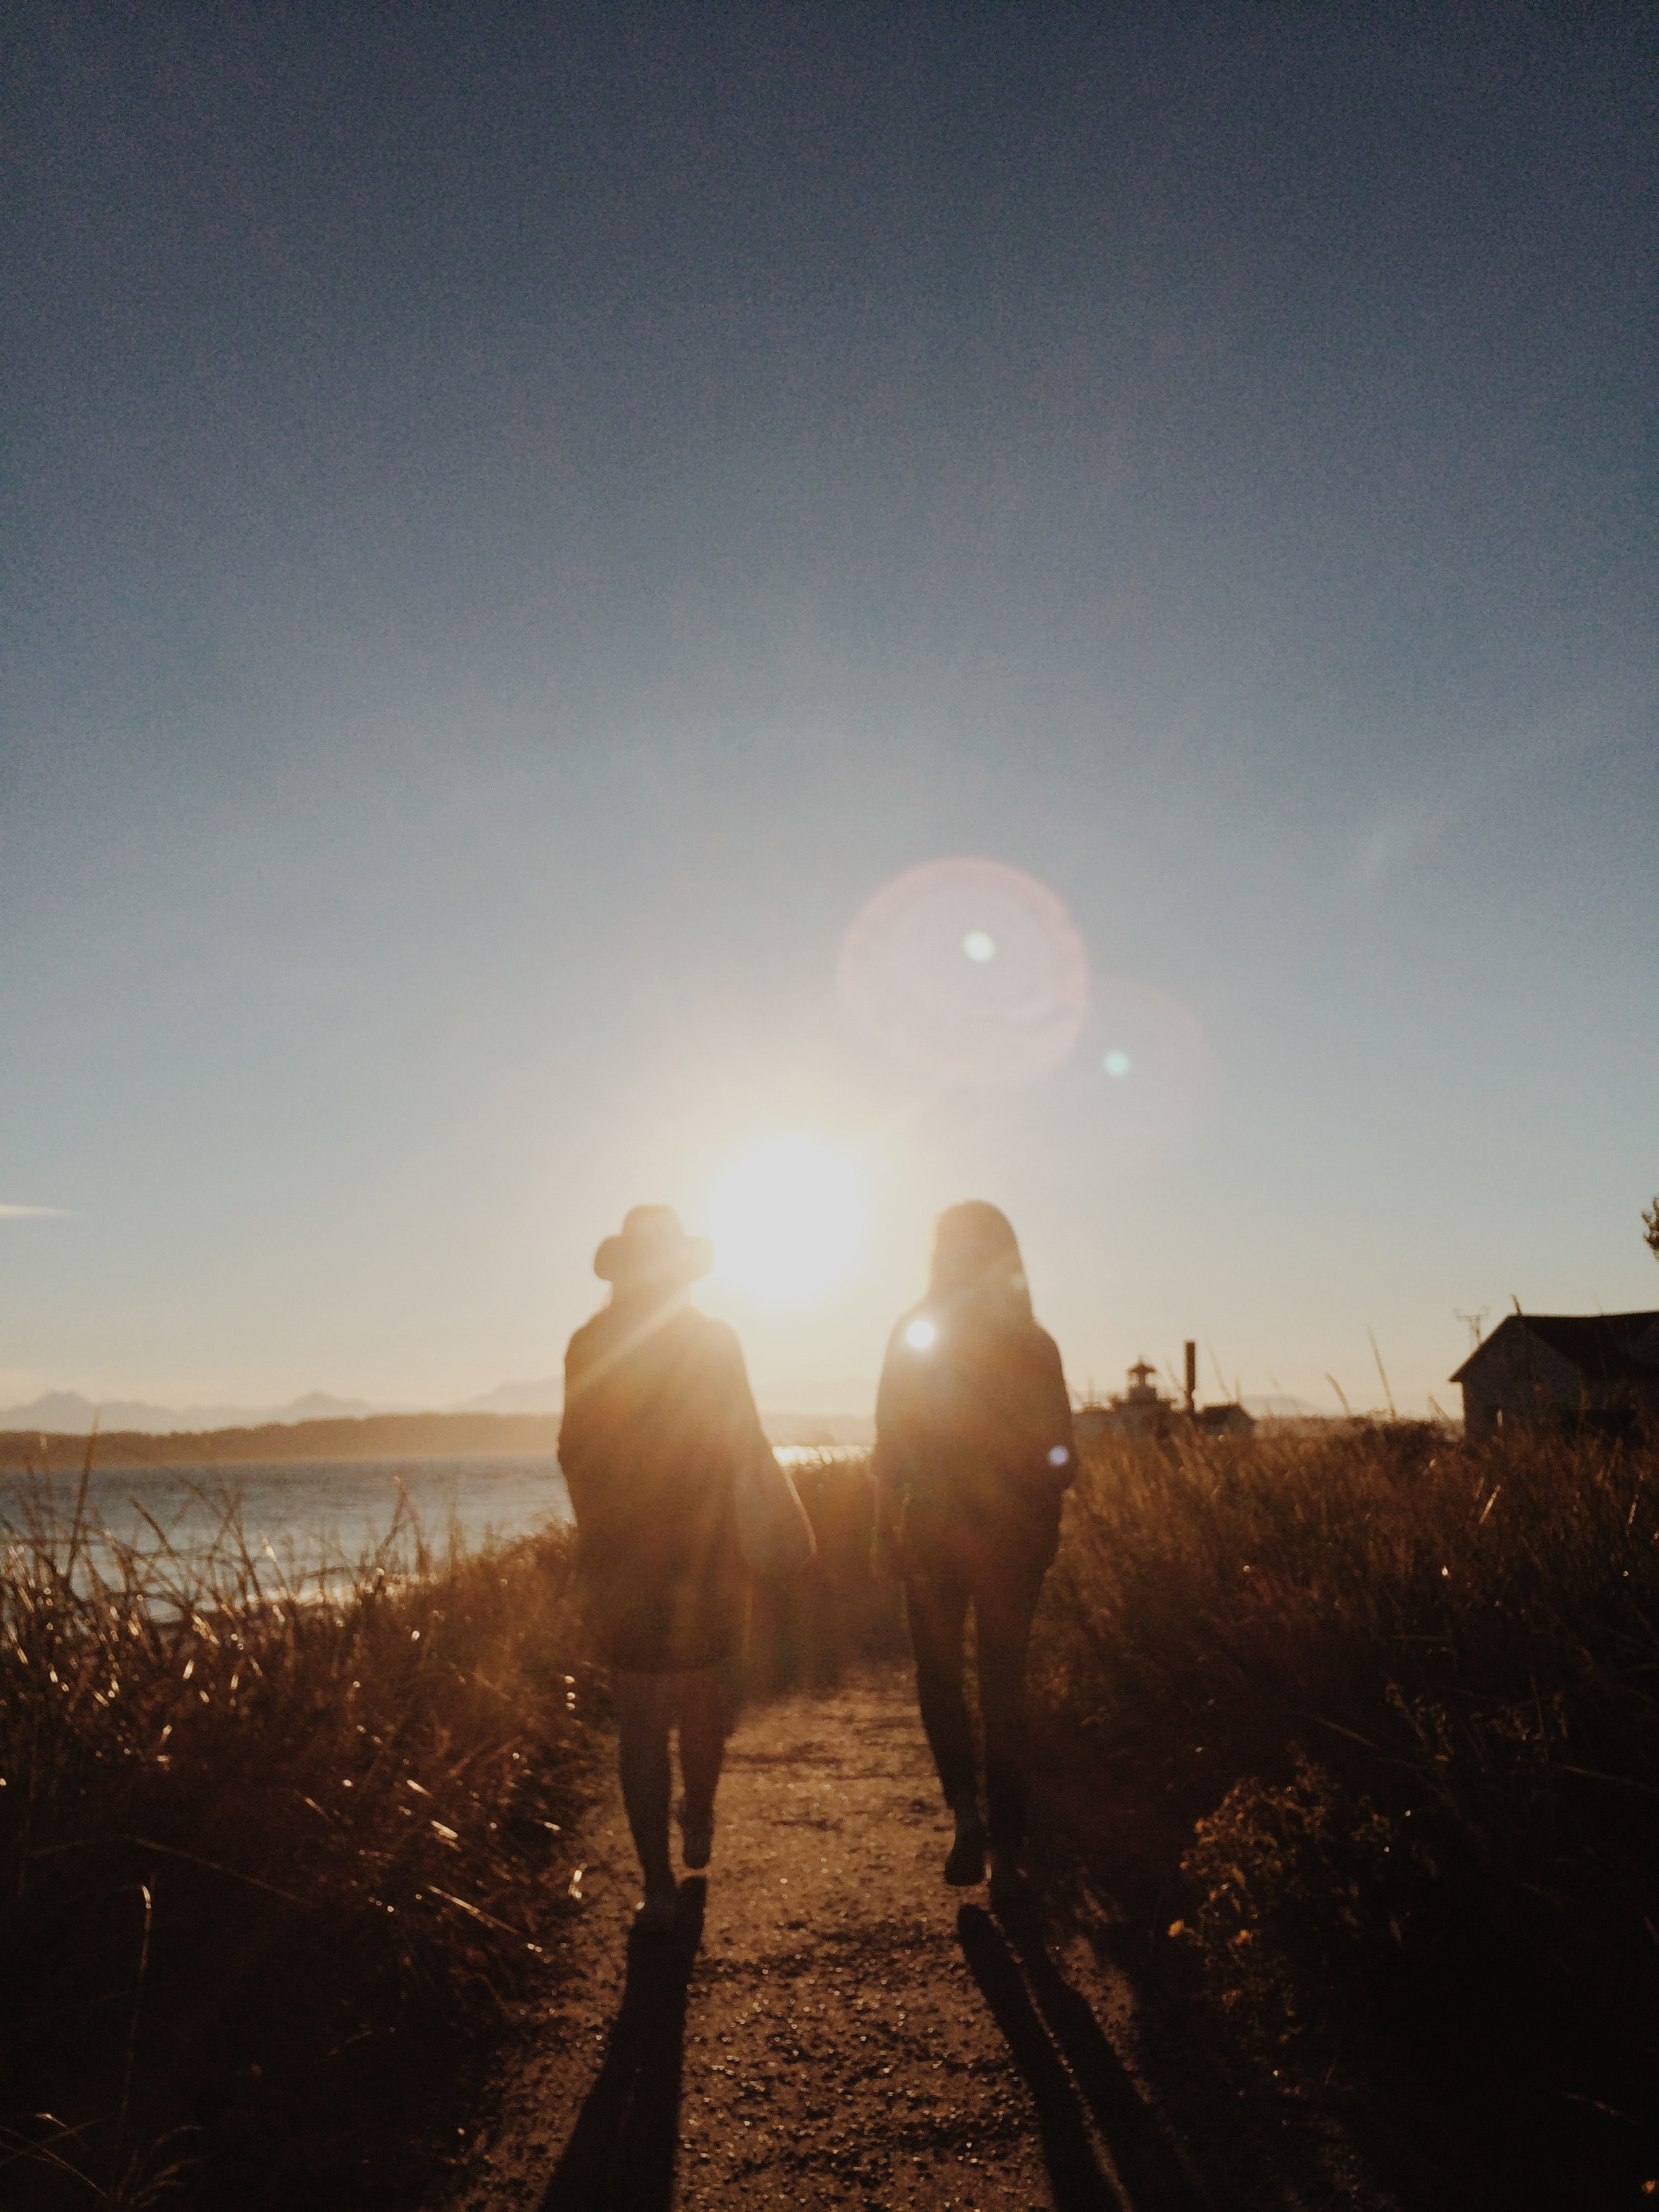 lens-flare-path-people-6940.jpg